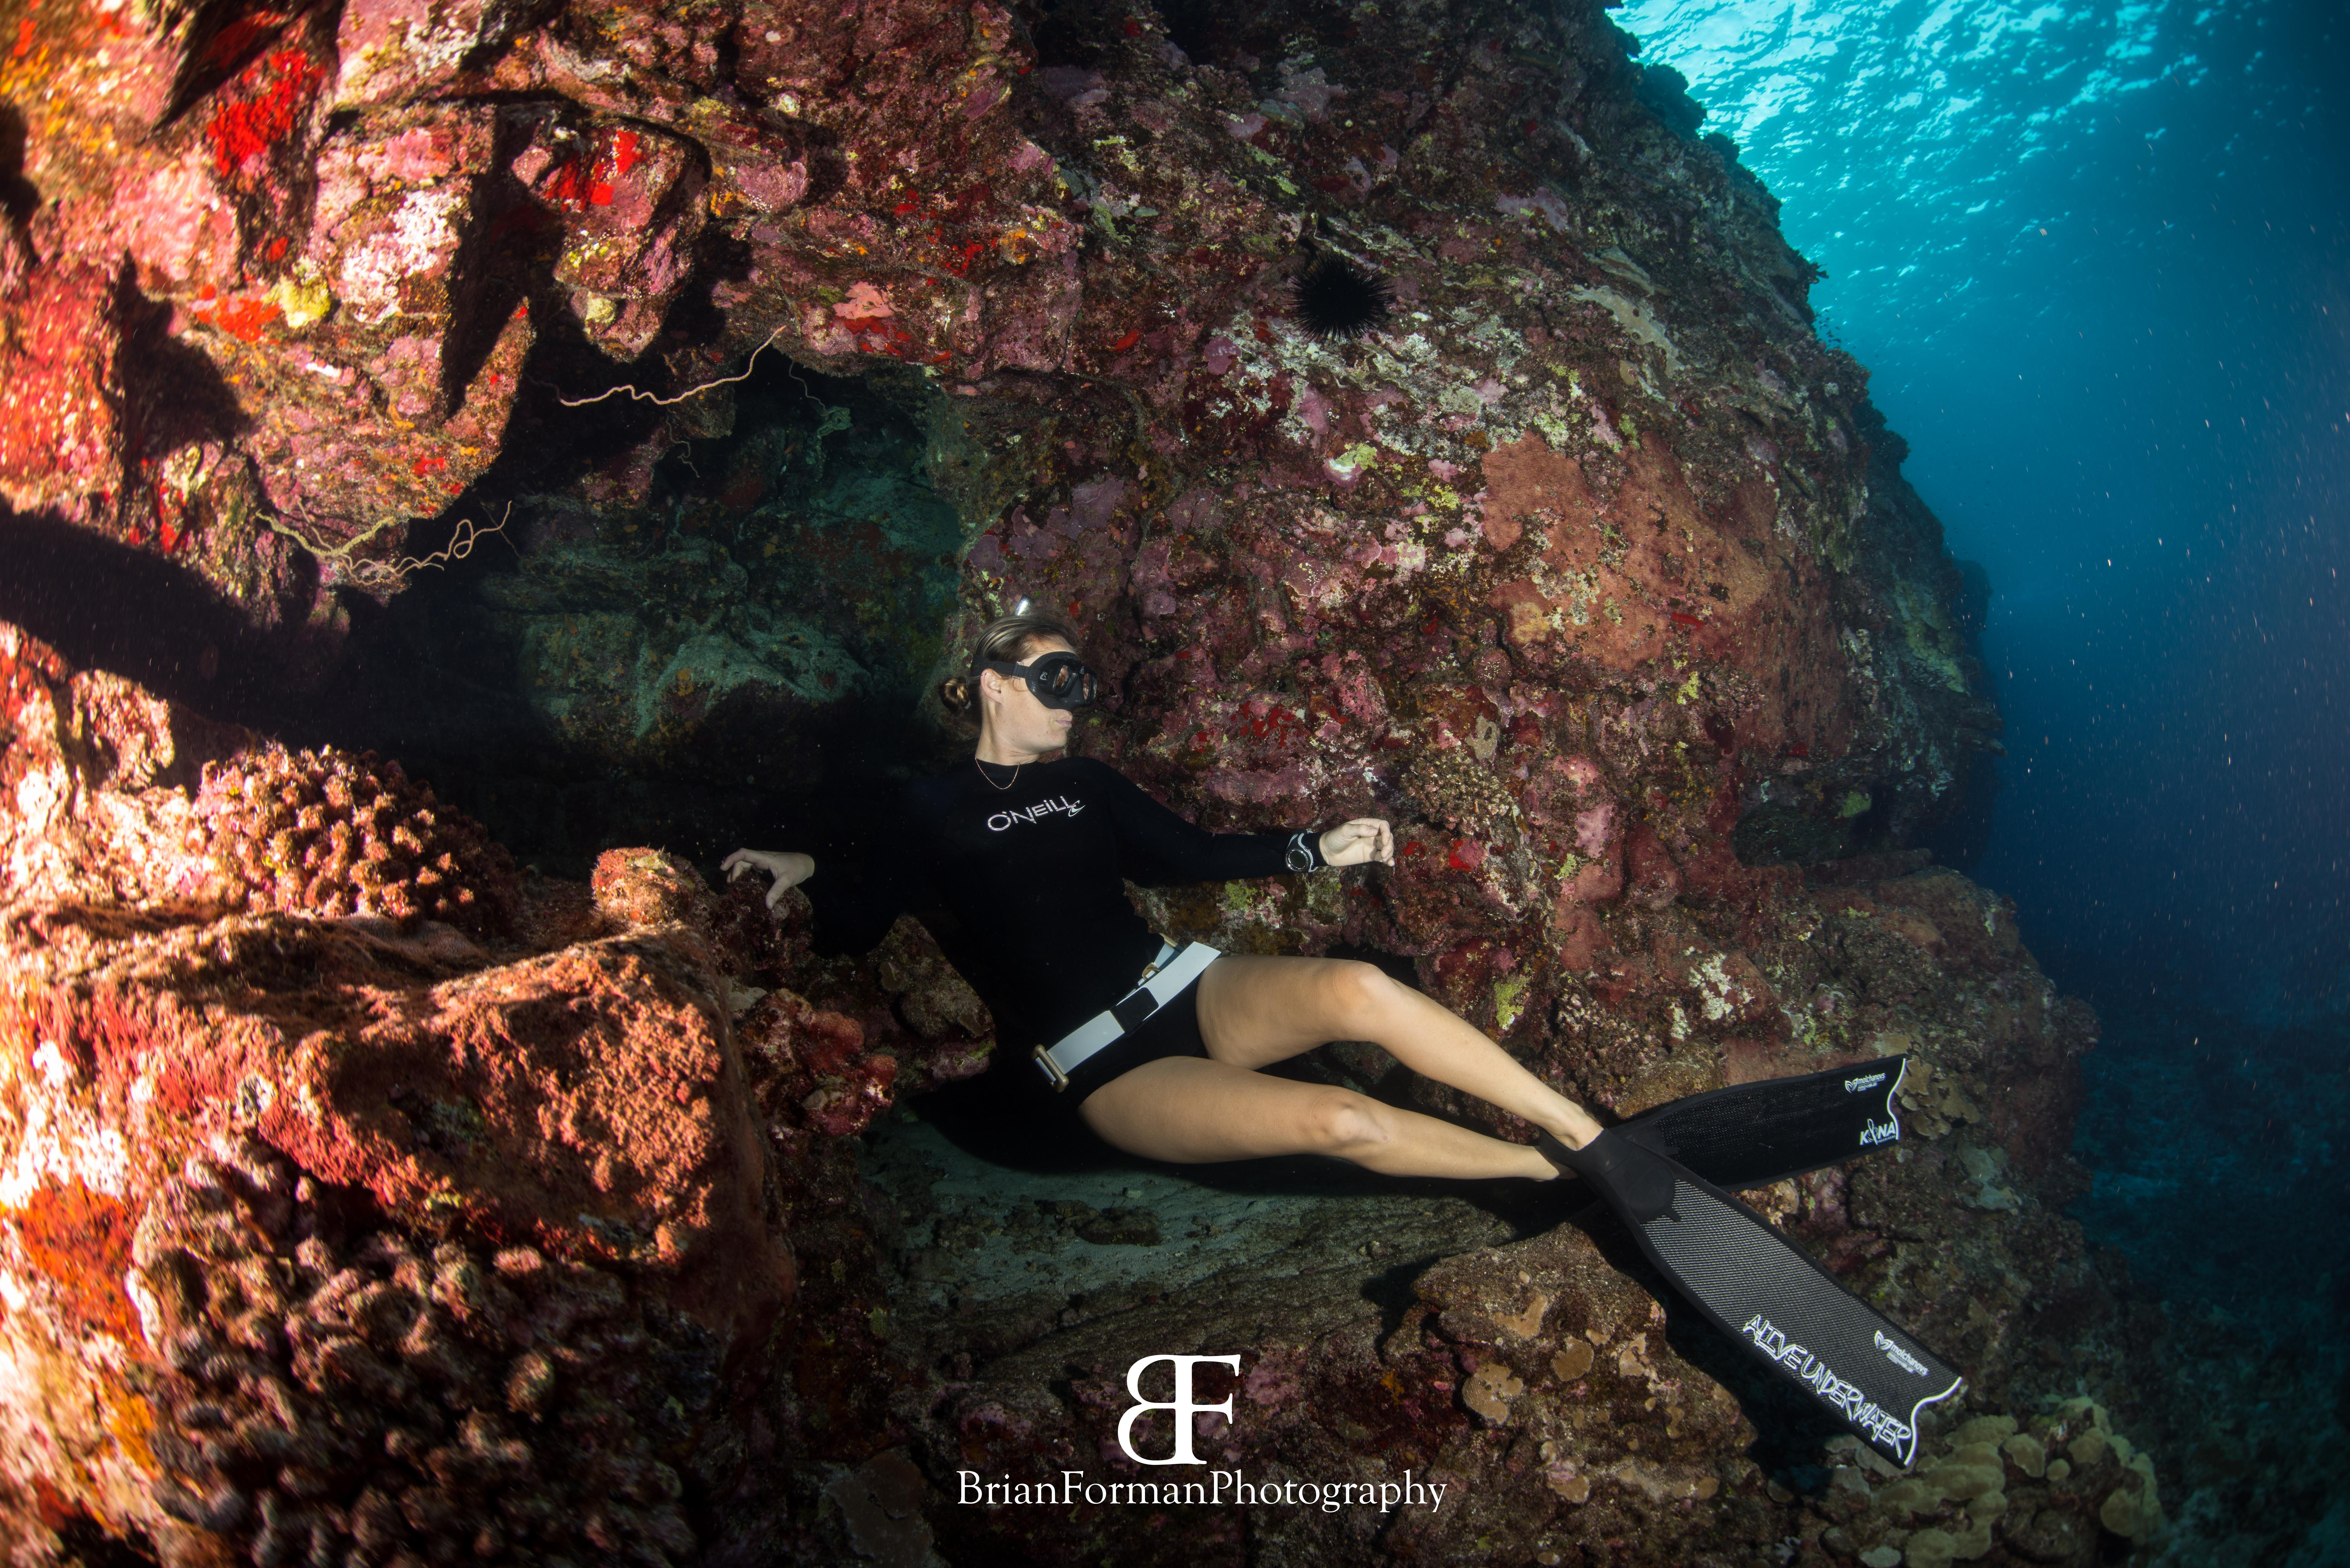 Heidi Hoover freediving